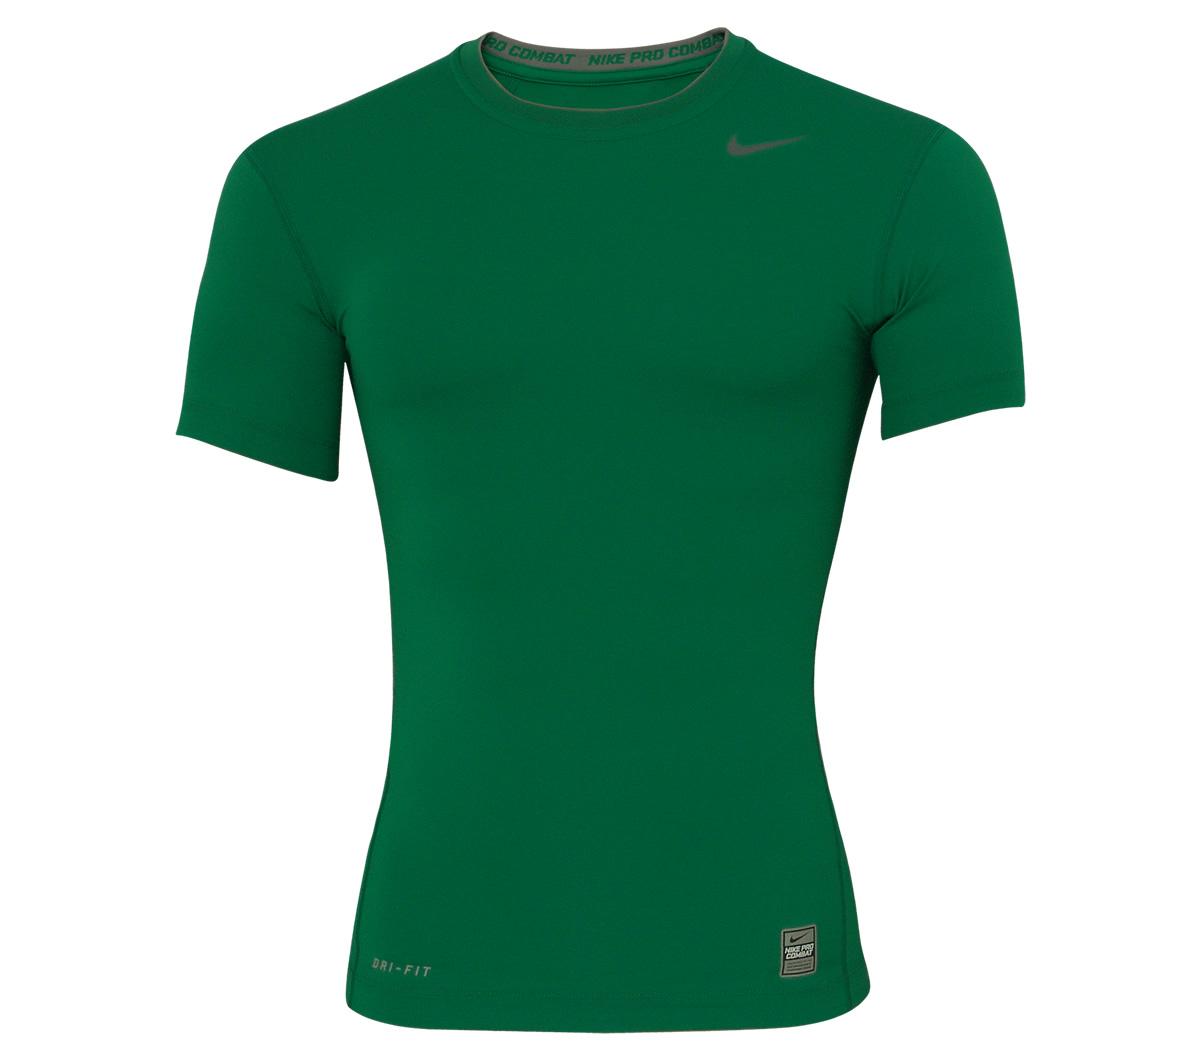 2cf1bb3b06775 Camisa Nike Pro Core Manga Curta Ajustado Verde - Mundo do Futebol